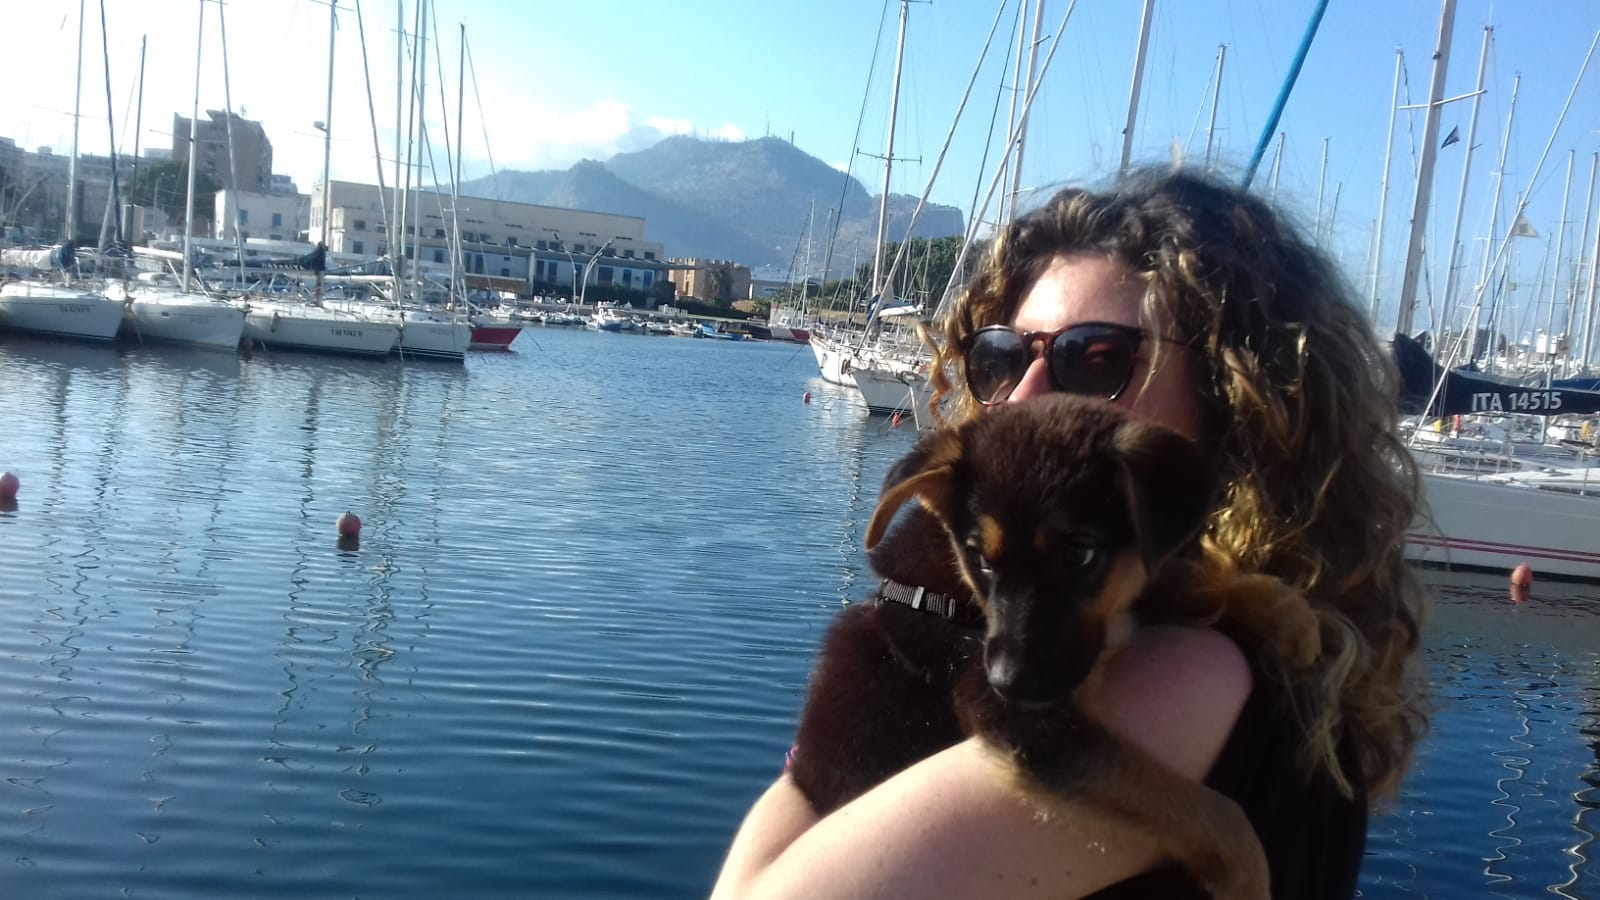 touristic port, Palermo, Italy